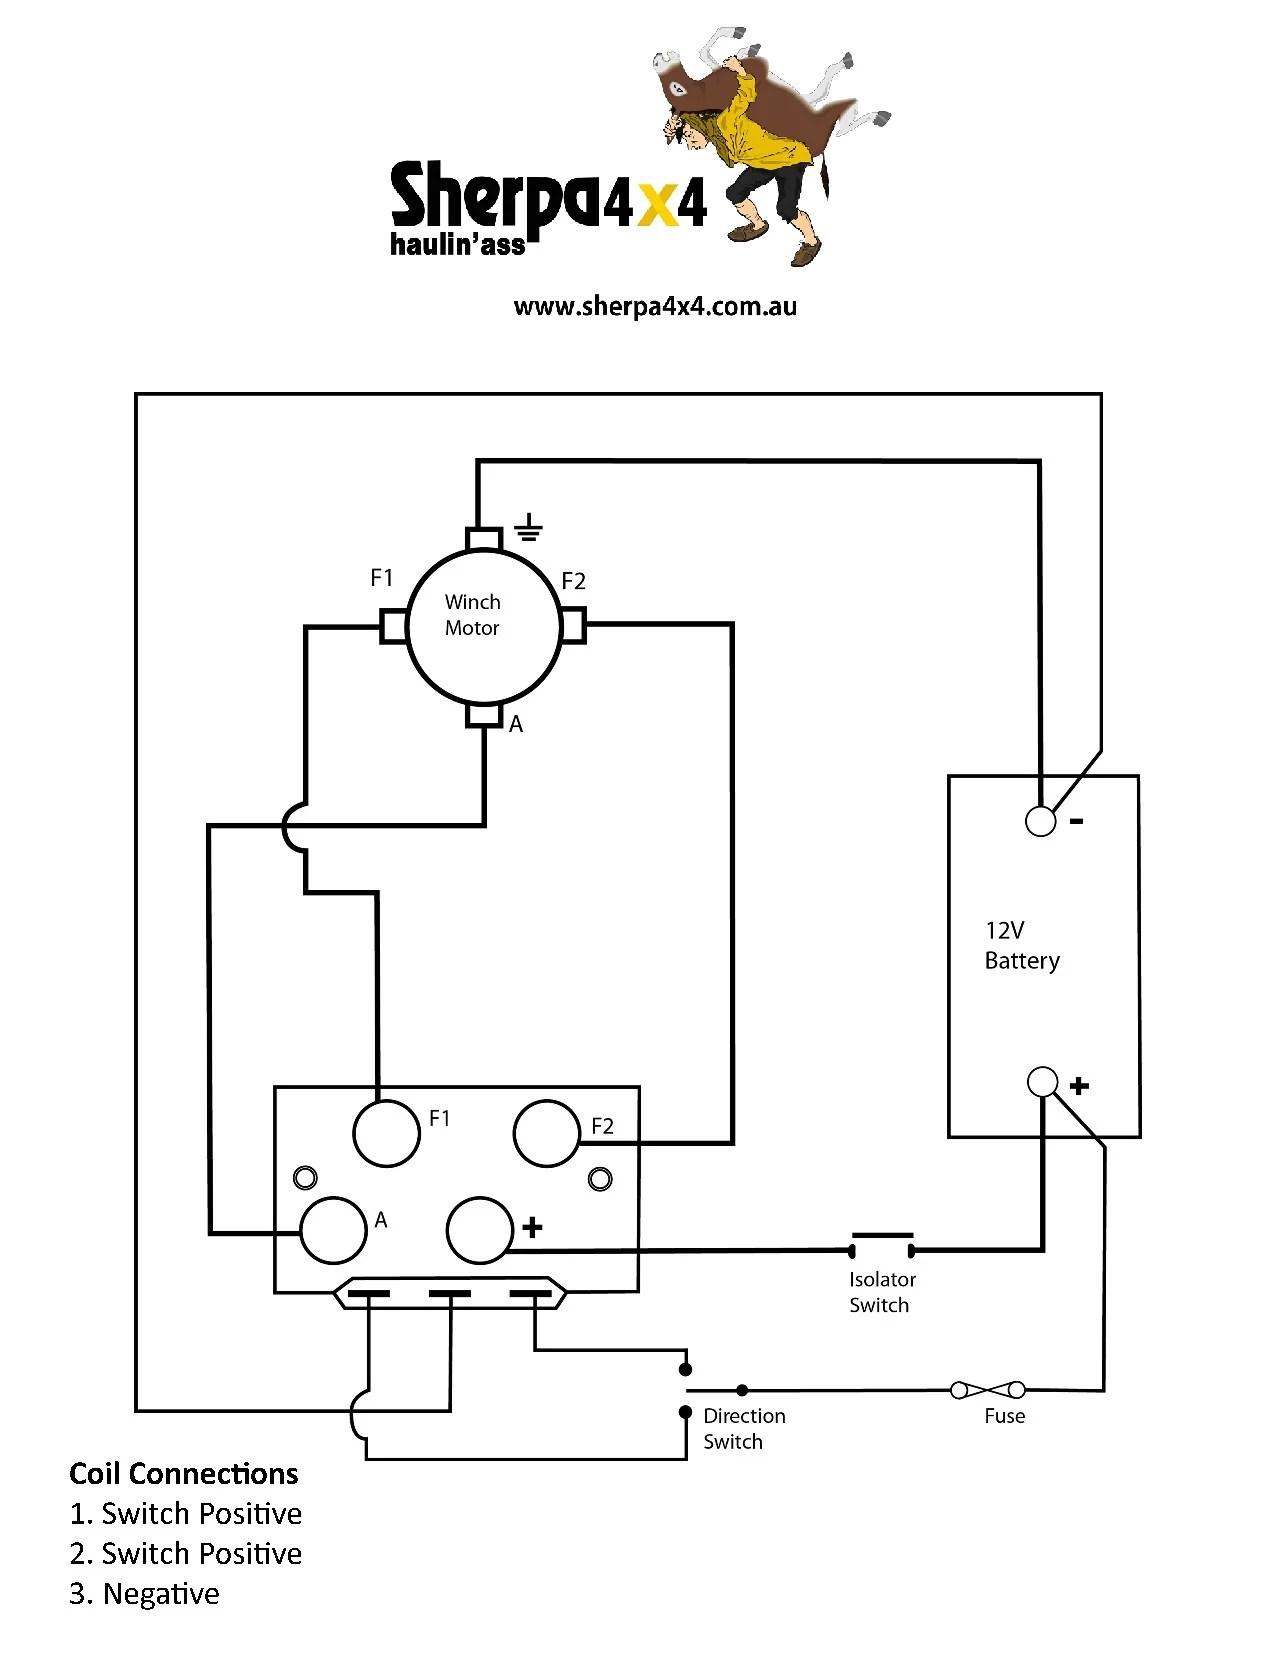 Astonishing Pierce Winch Ps534H Wiring Diagram Wiring Diagram Data Wiring Digital Resources Kookcompassionincorg